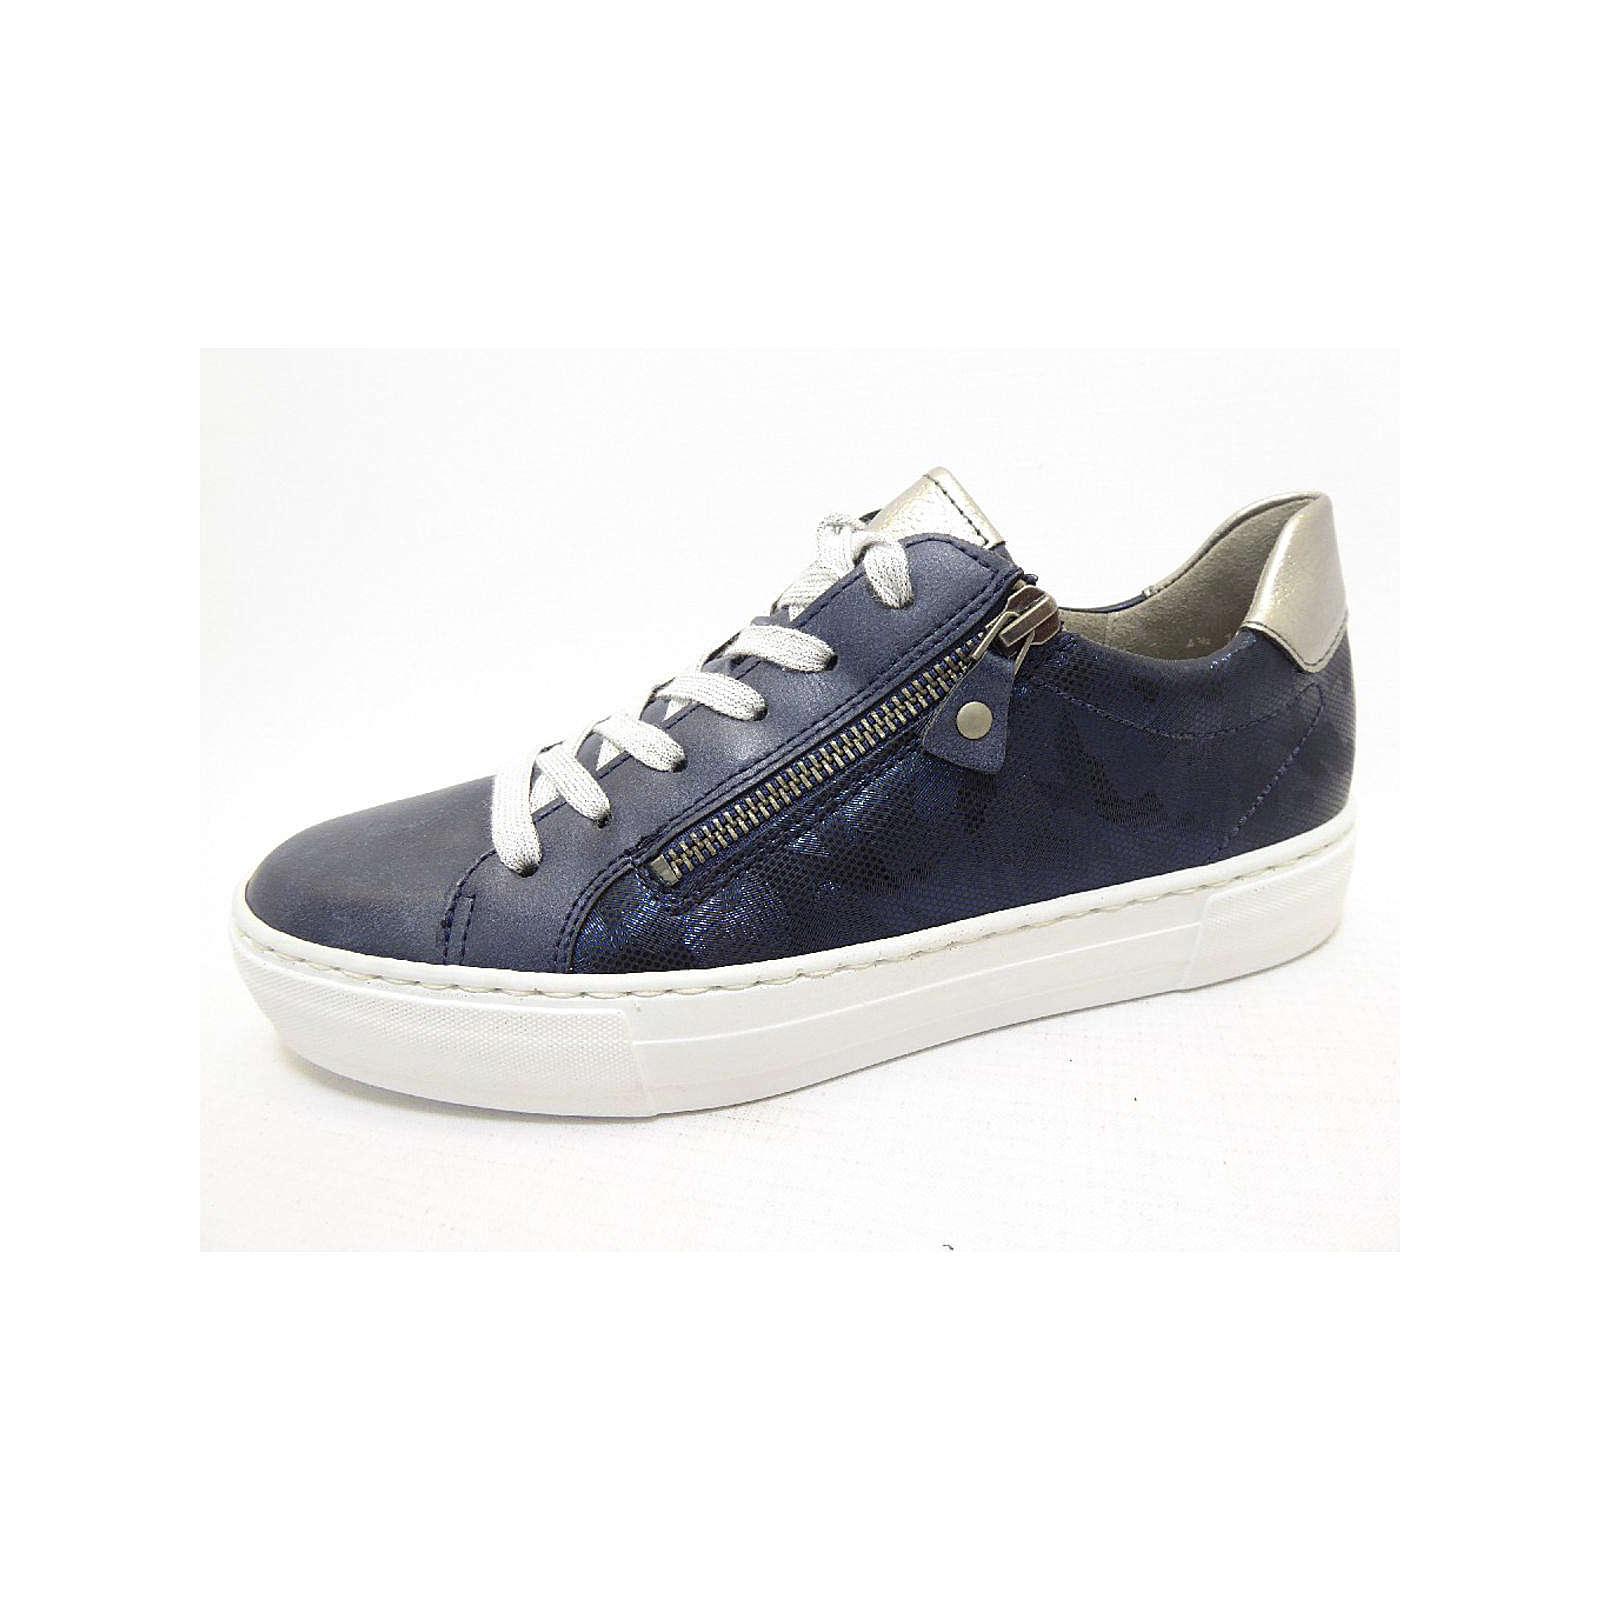 ara Sneakers blau blau Damen Gr. 37,5